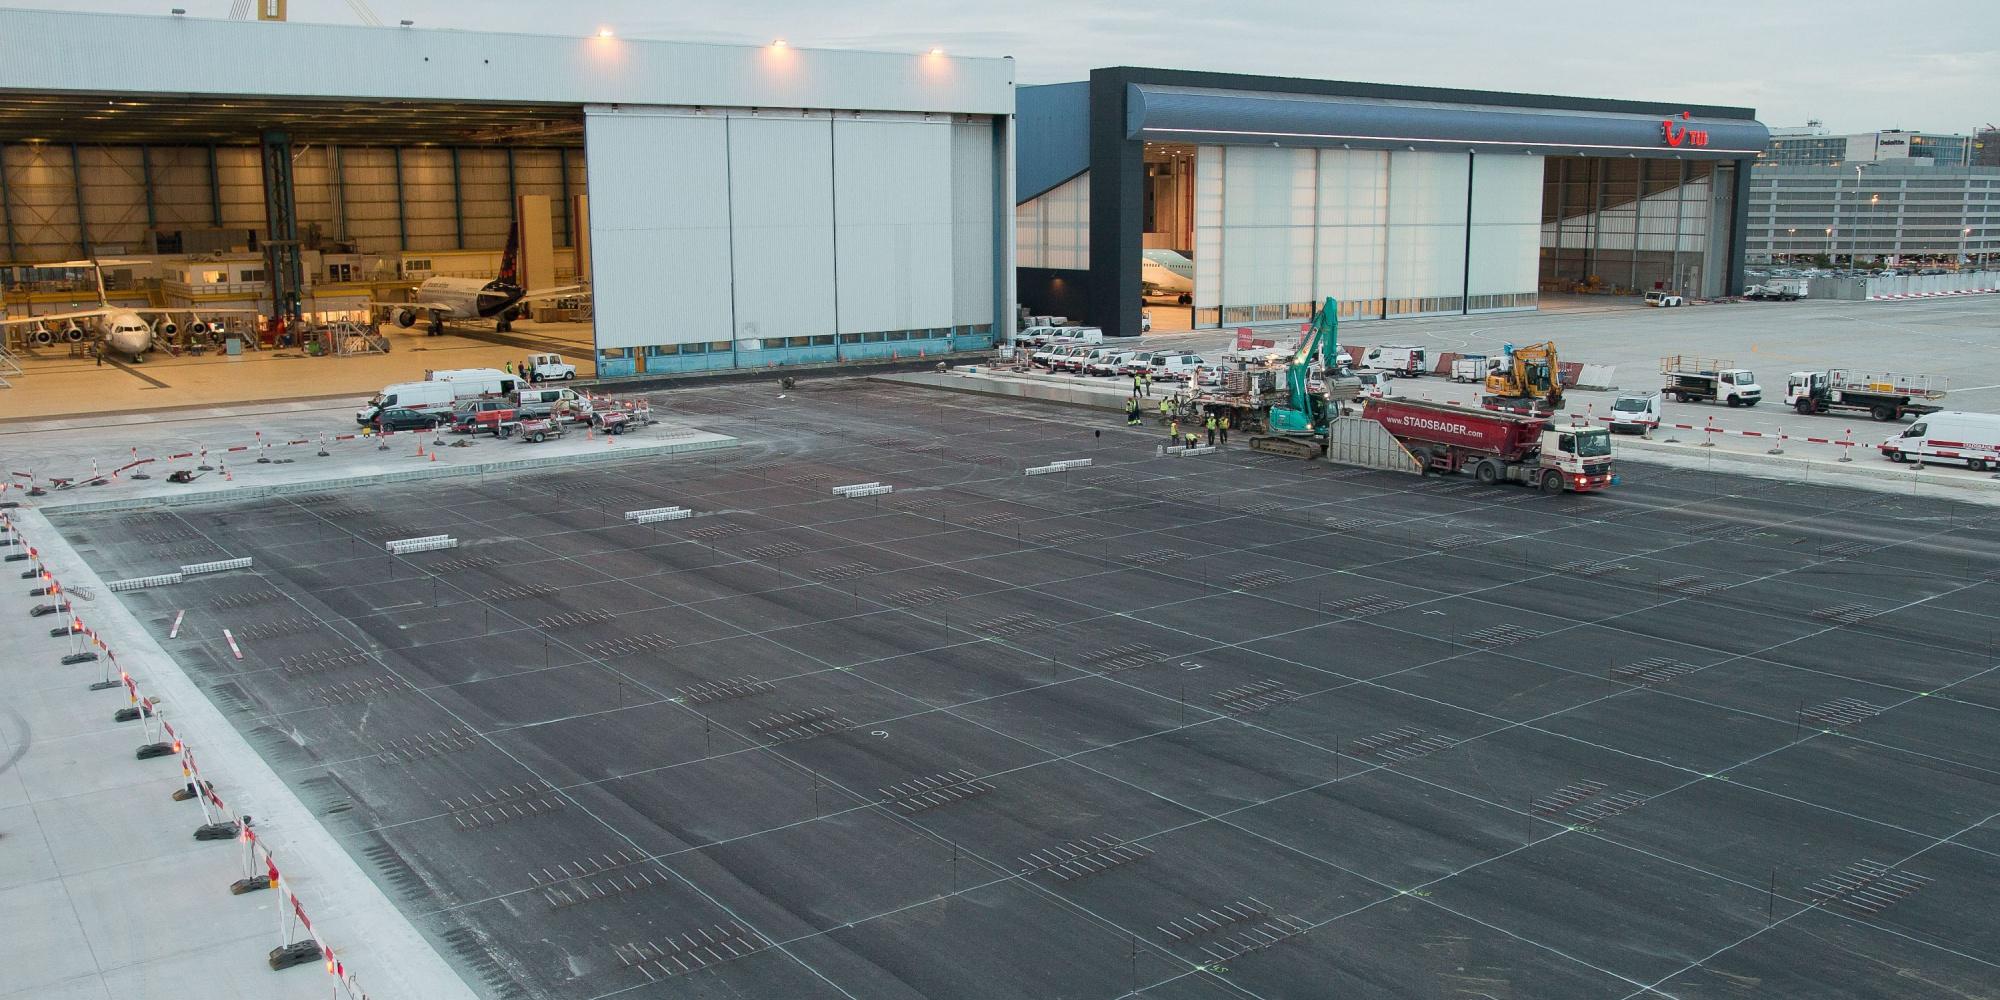 infra-zaventem-beton2